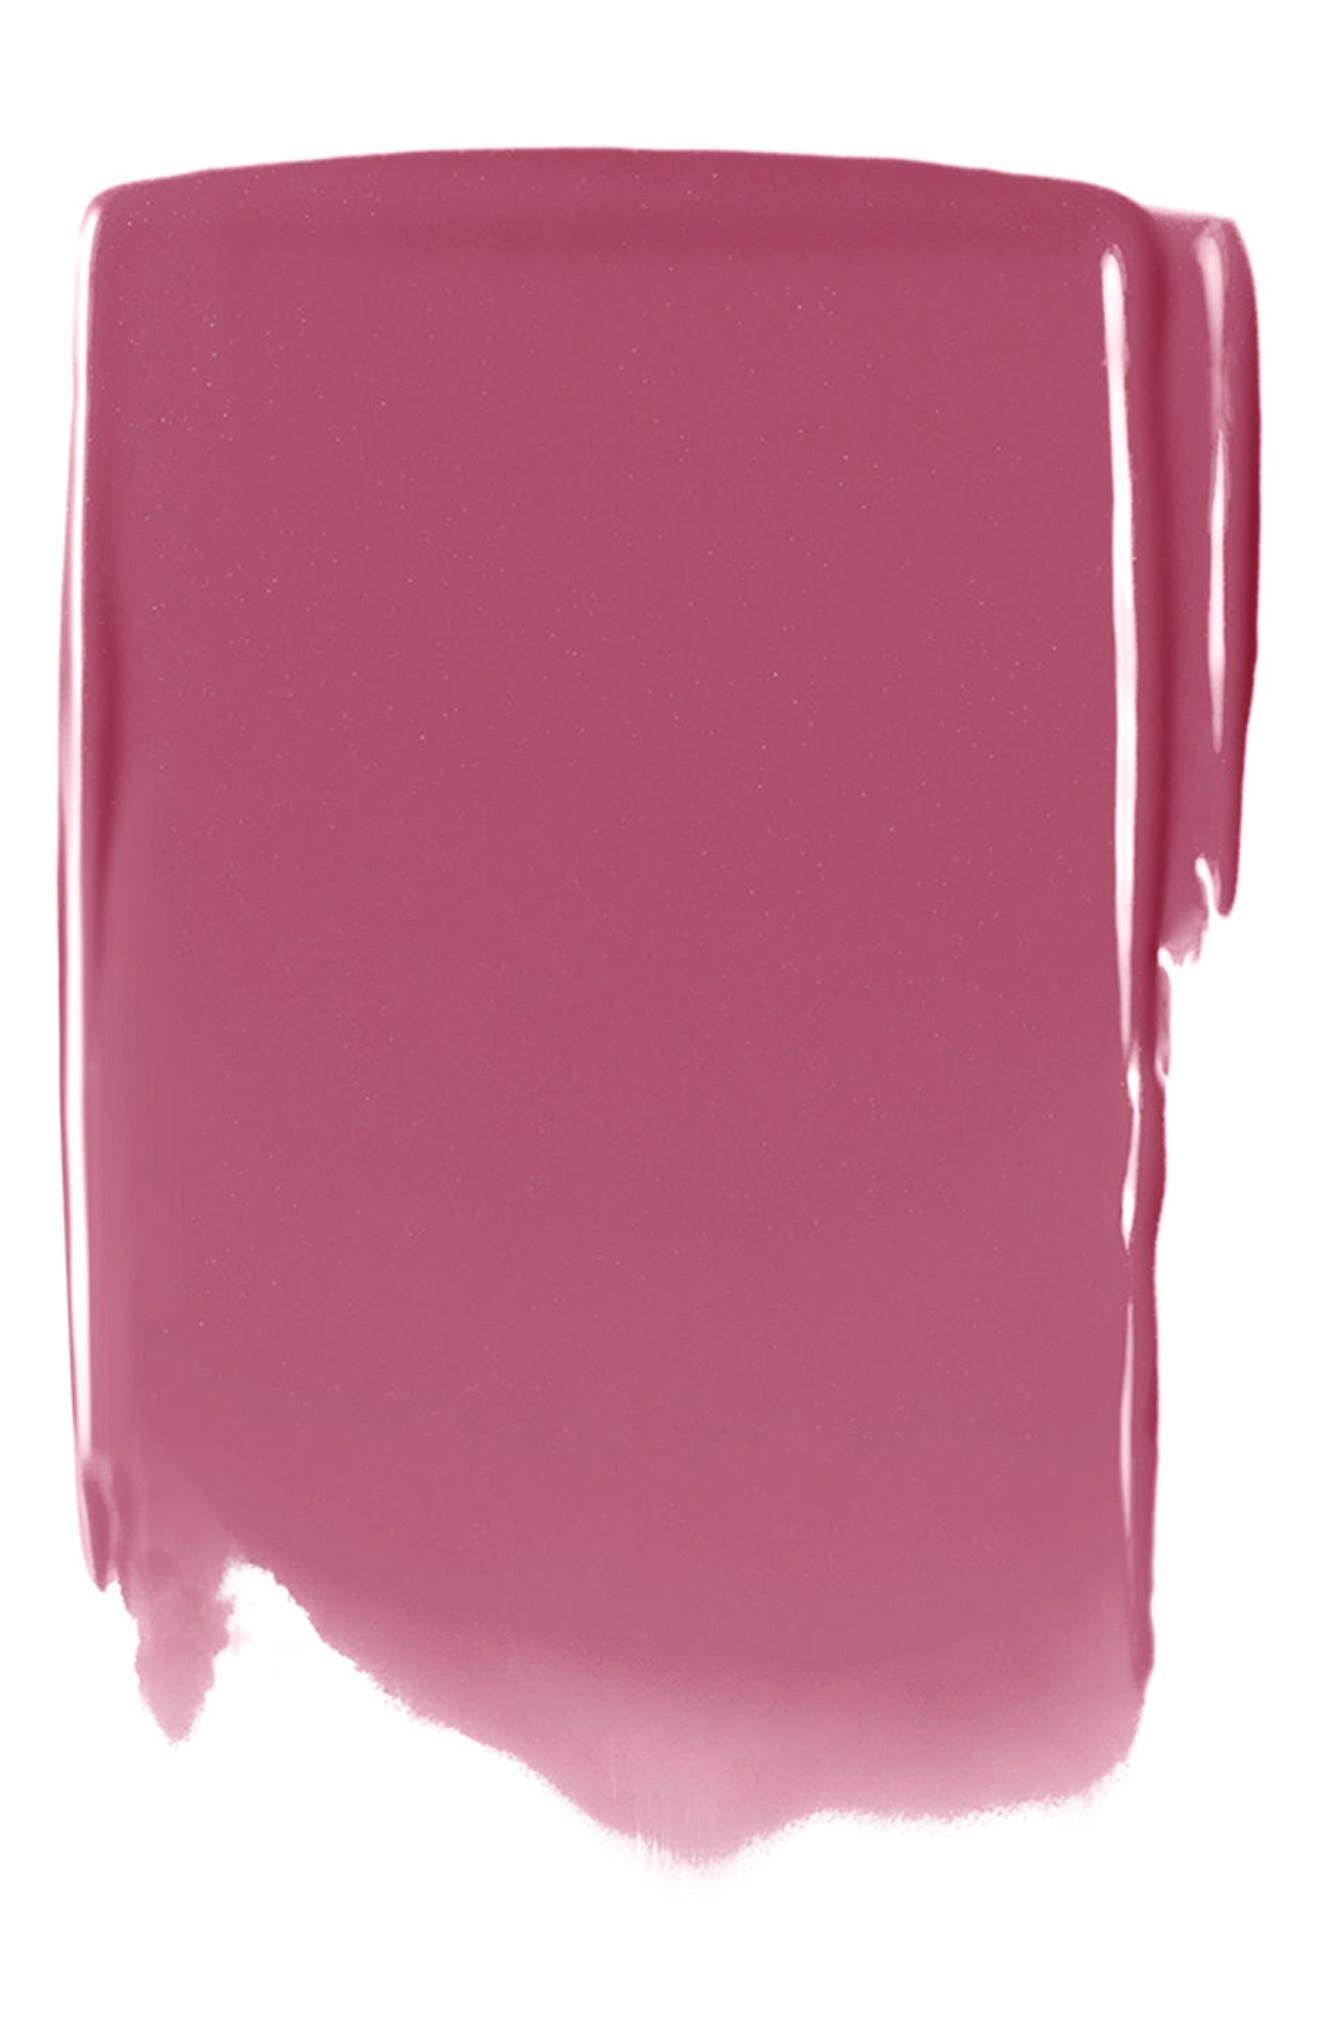 Undressed Liquid Lip Set II,                             Alternate thumbnail 9, color,                             000